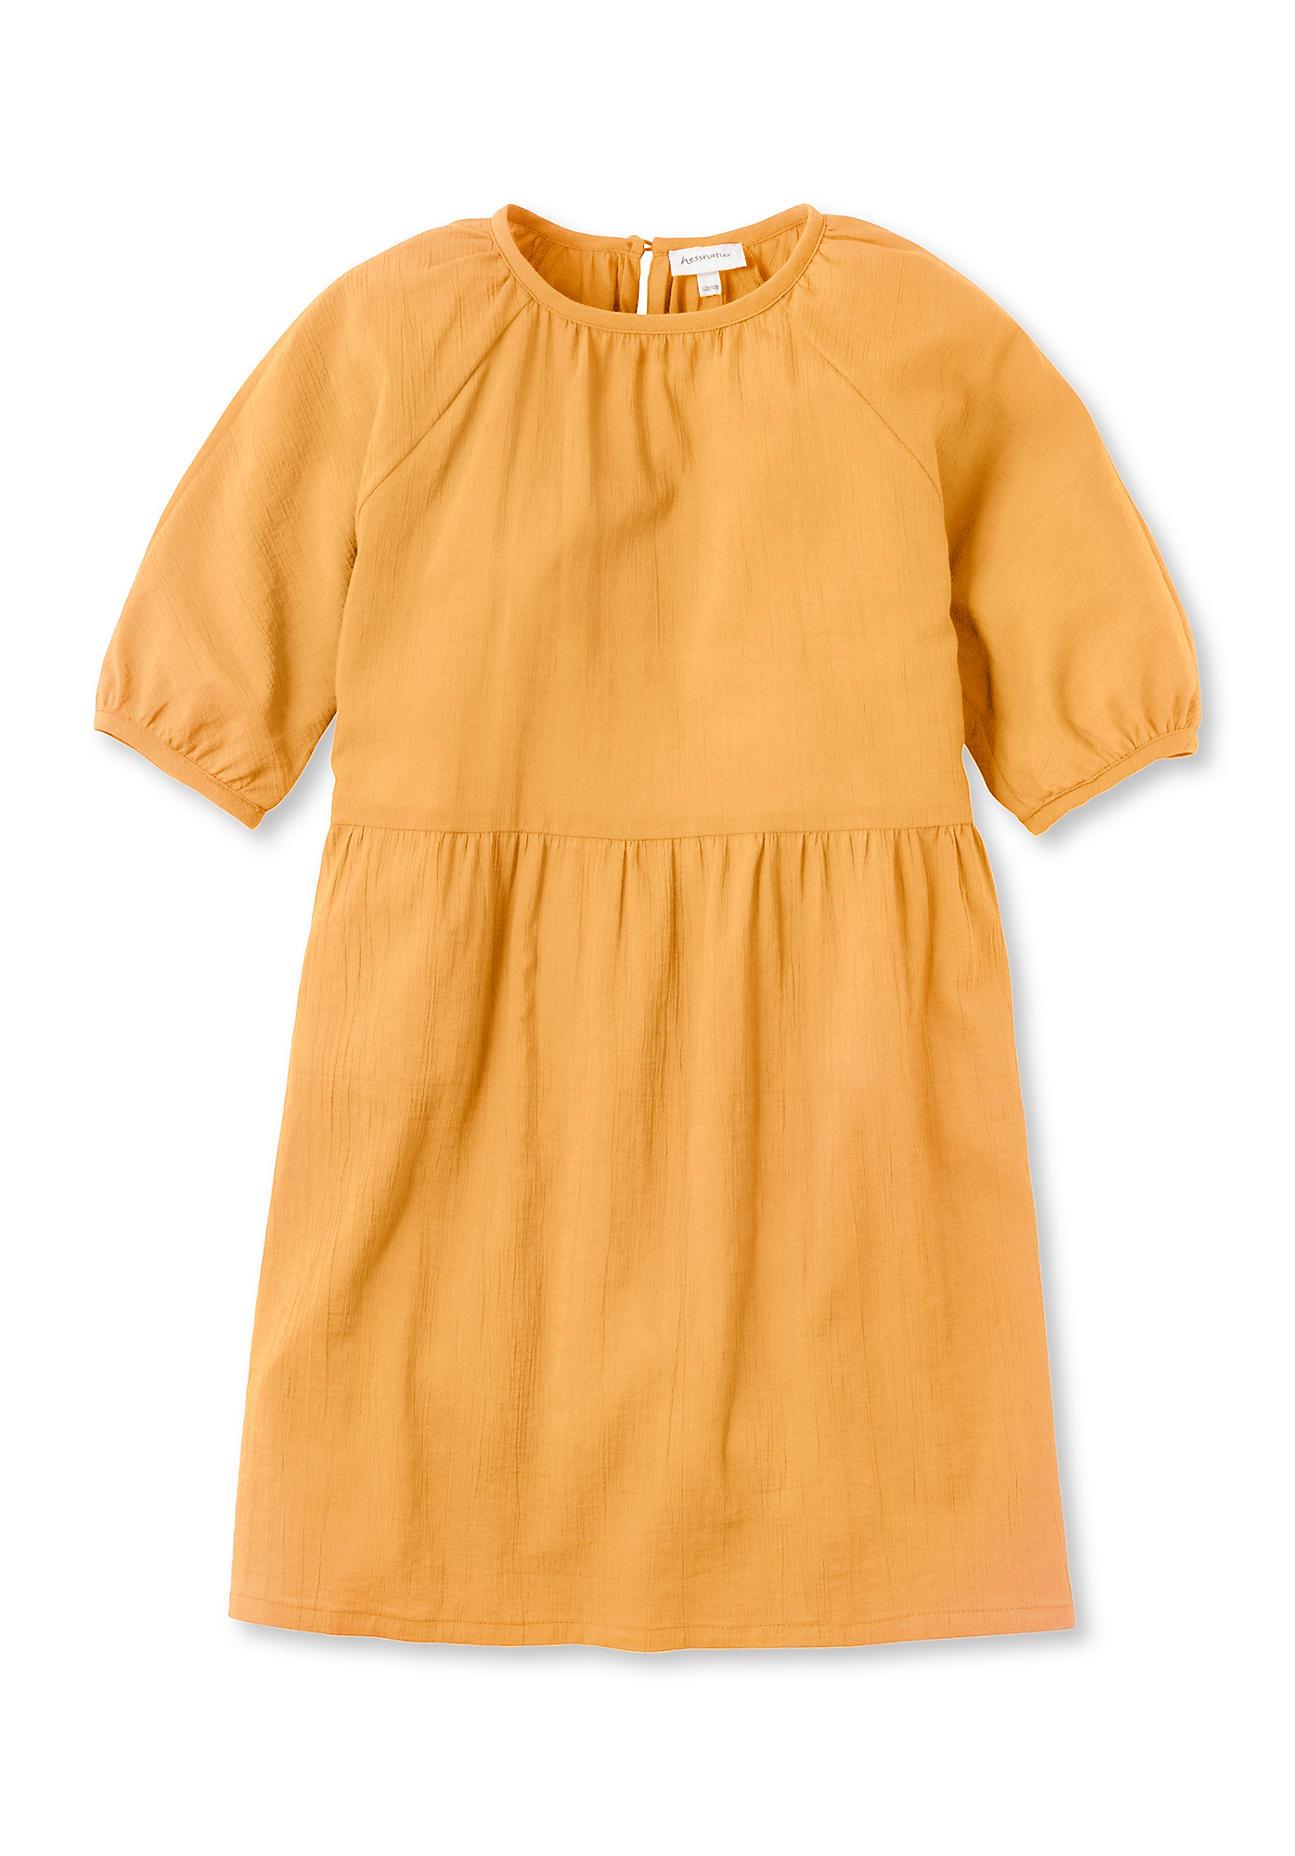 hessnatur Kinder Volantkleid - gelb Größe 158/164